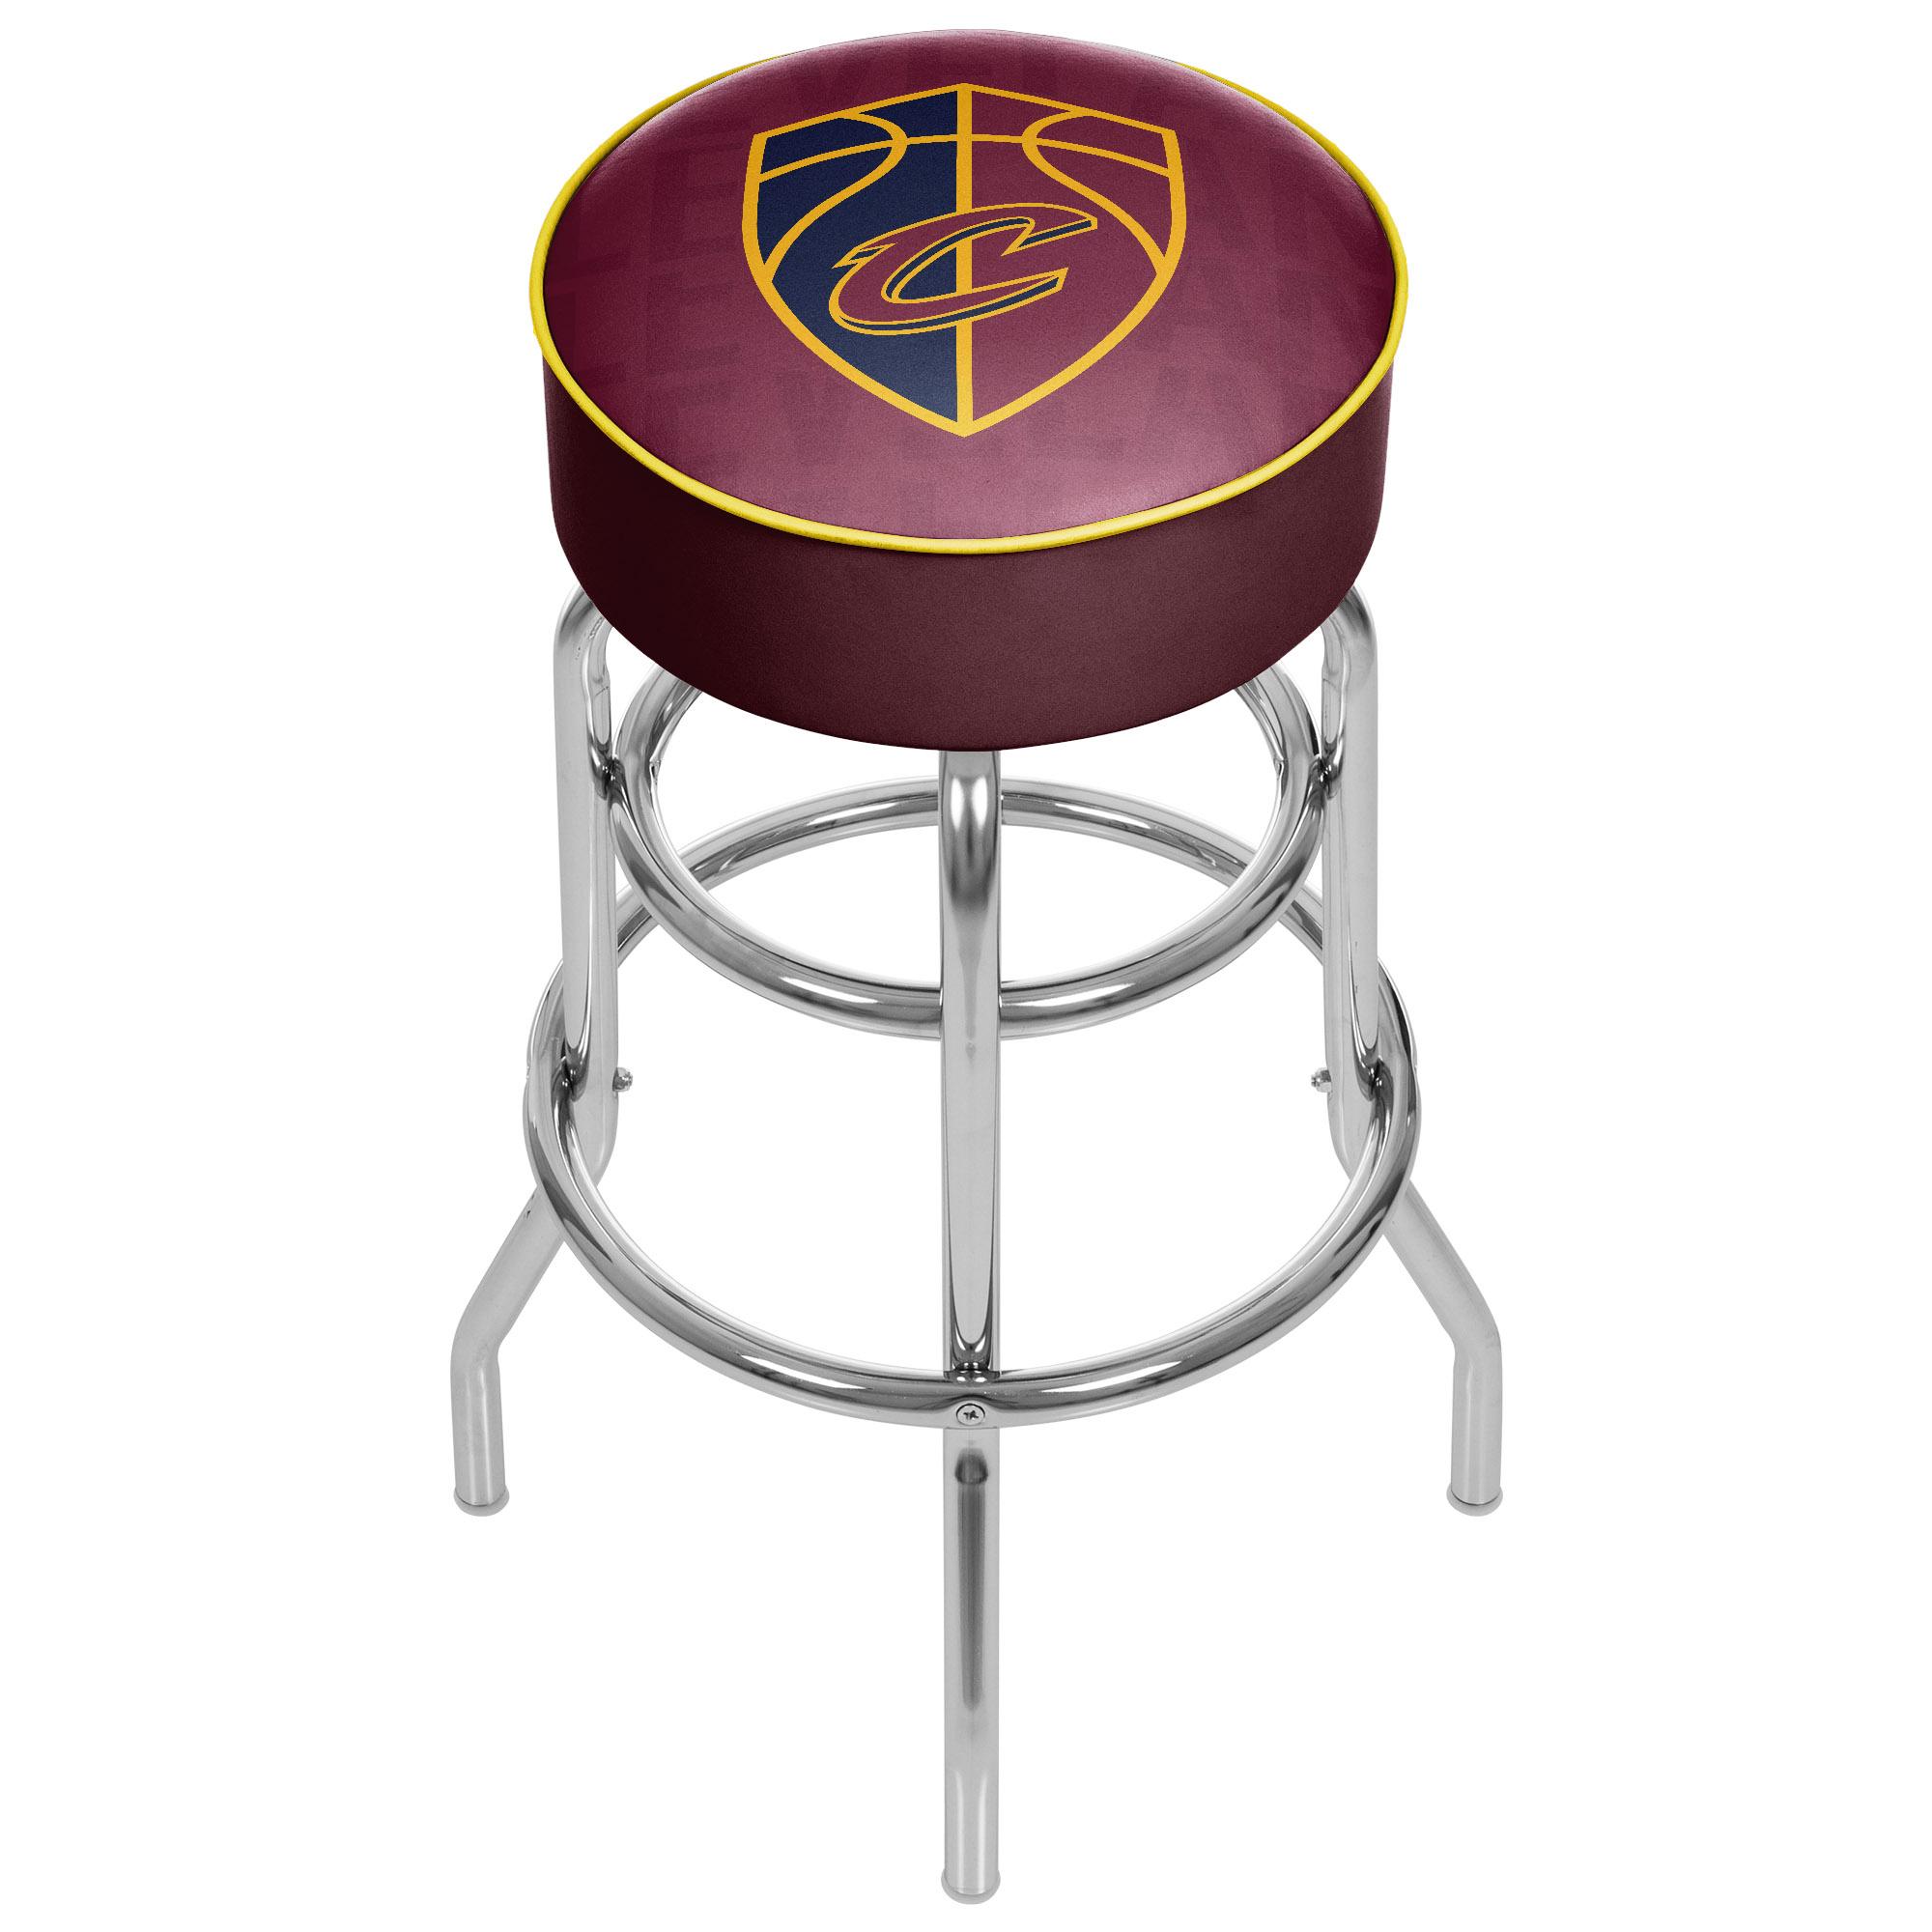 Cleveland Cavaliers NBA Padded Swivel Bar Stool - City